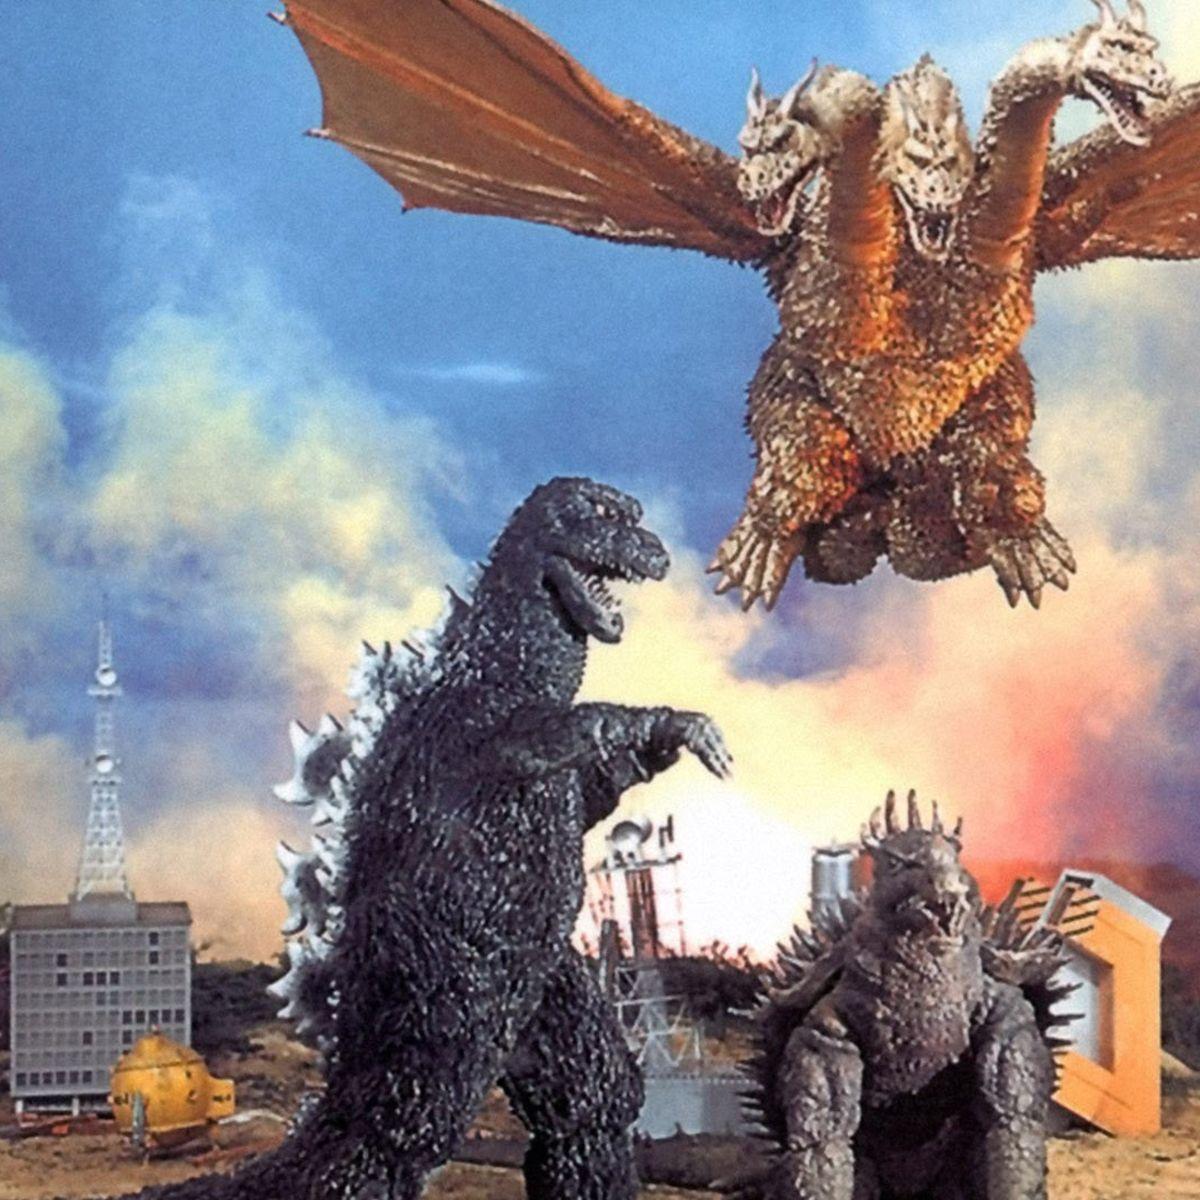 5 silly toho monster moments we hope the new godzilla movies keep